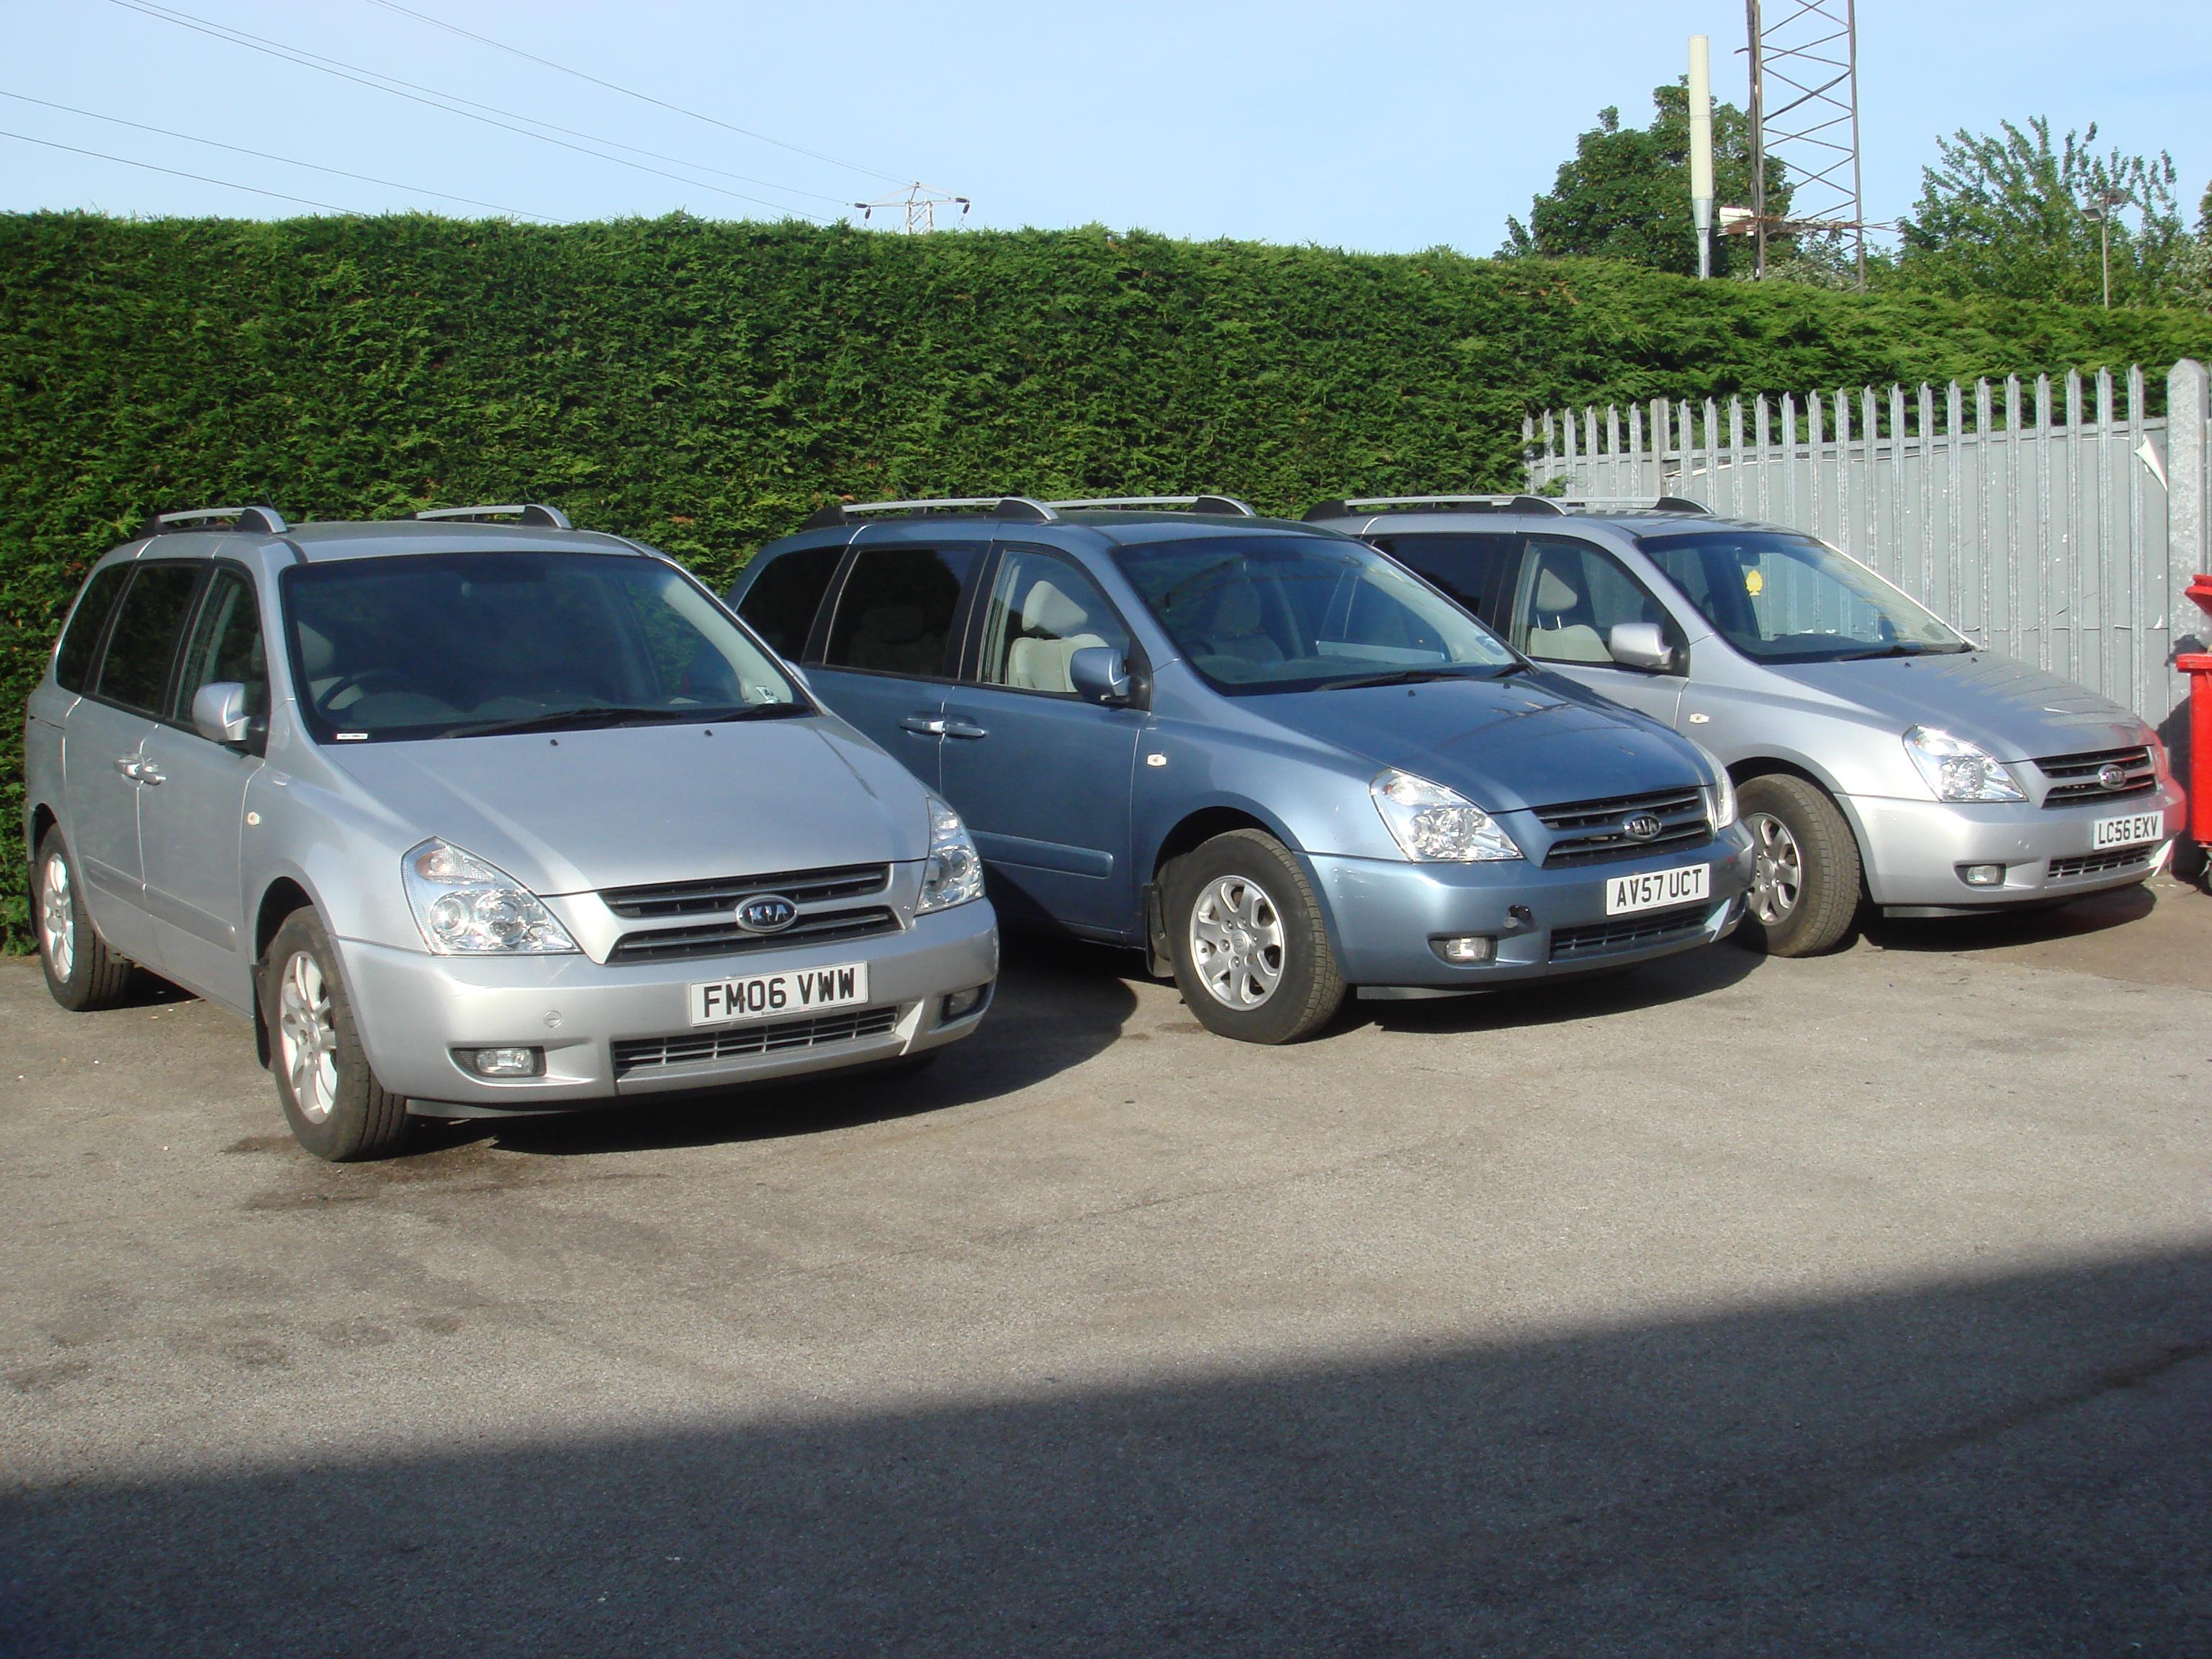 seattle kia used wa auto king sedona near bainbridge cb credit lx